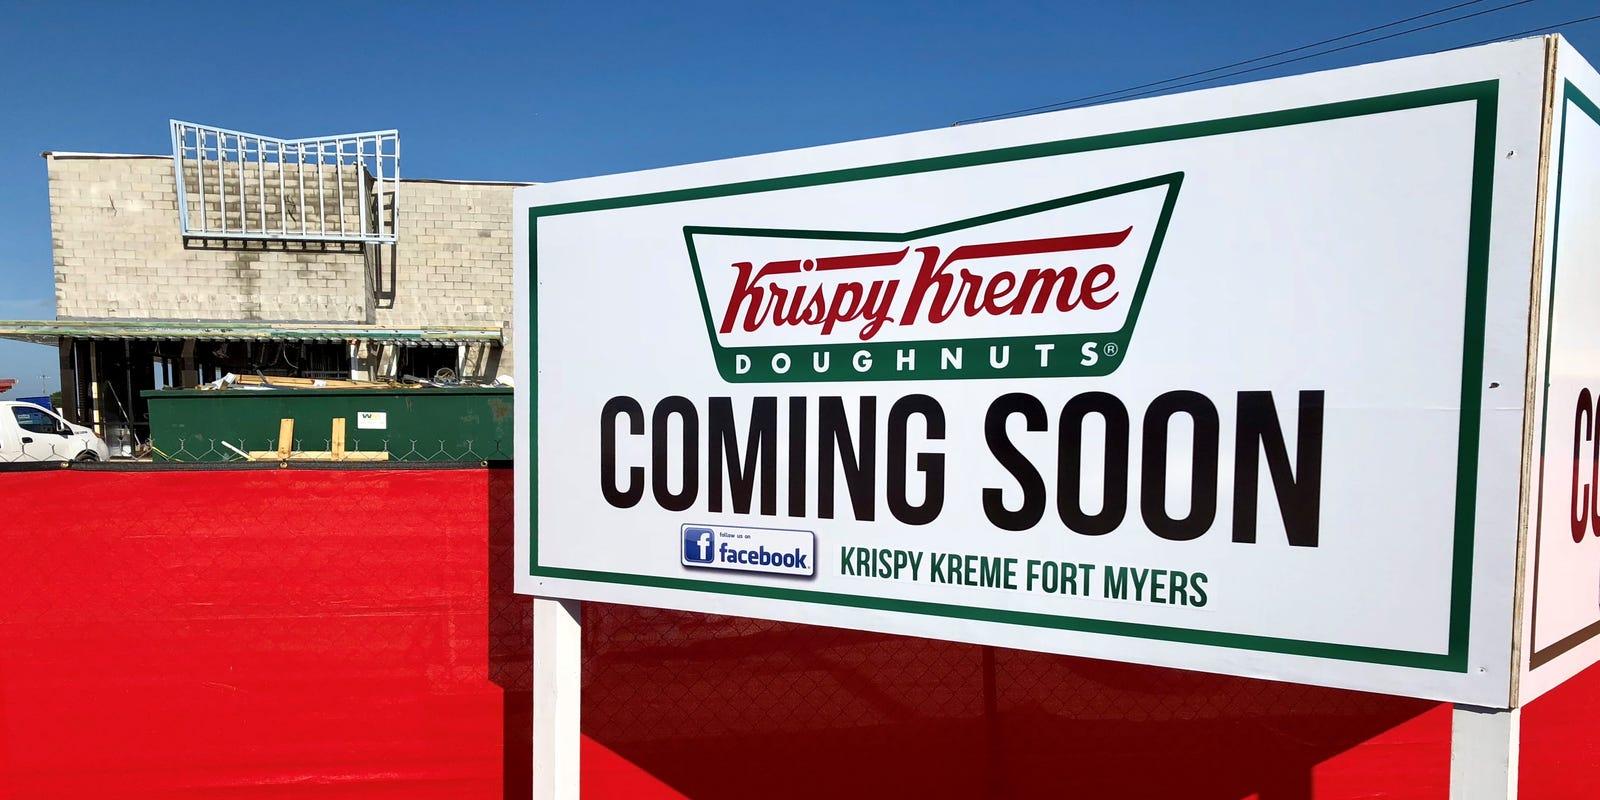 Krispy Kreme Fort Myers Announces Opening Date Hot Doughnuts Soon